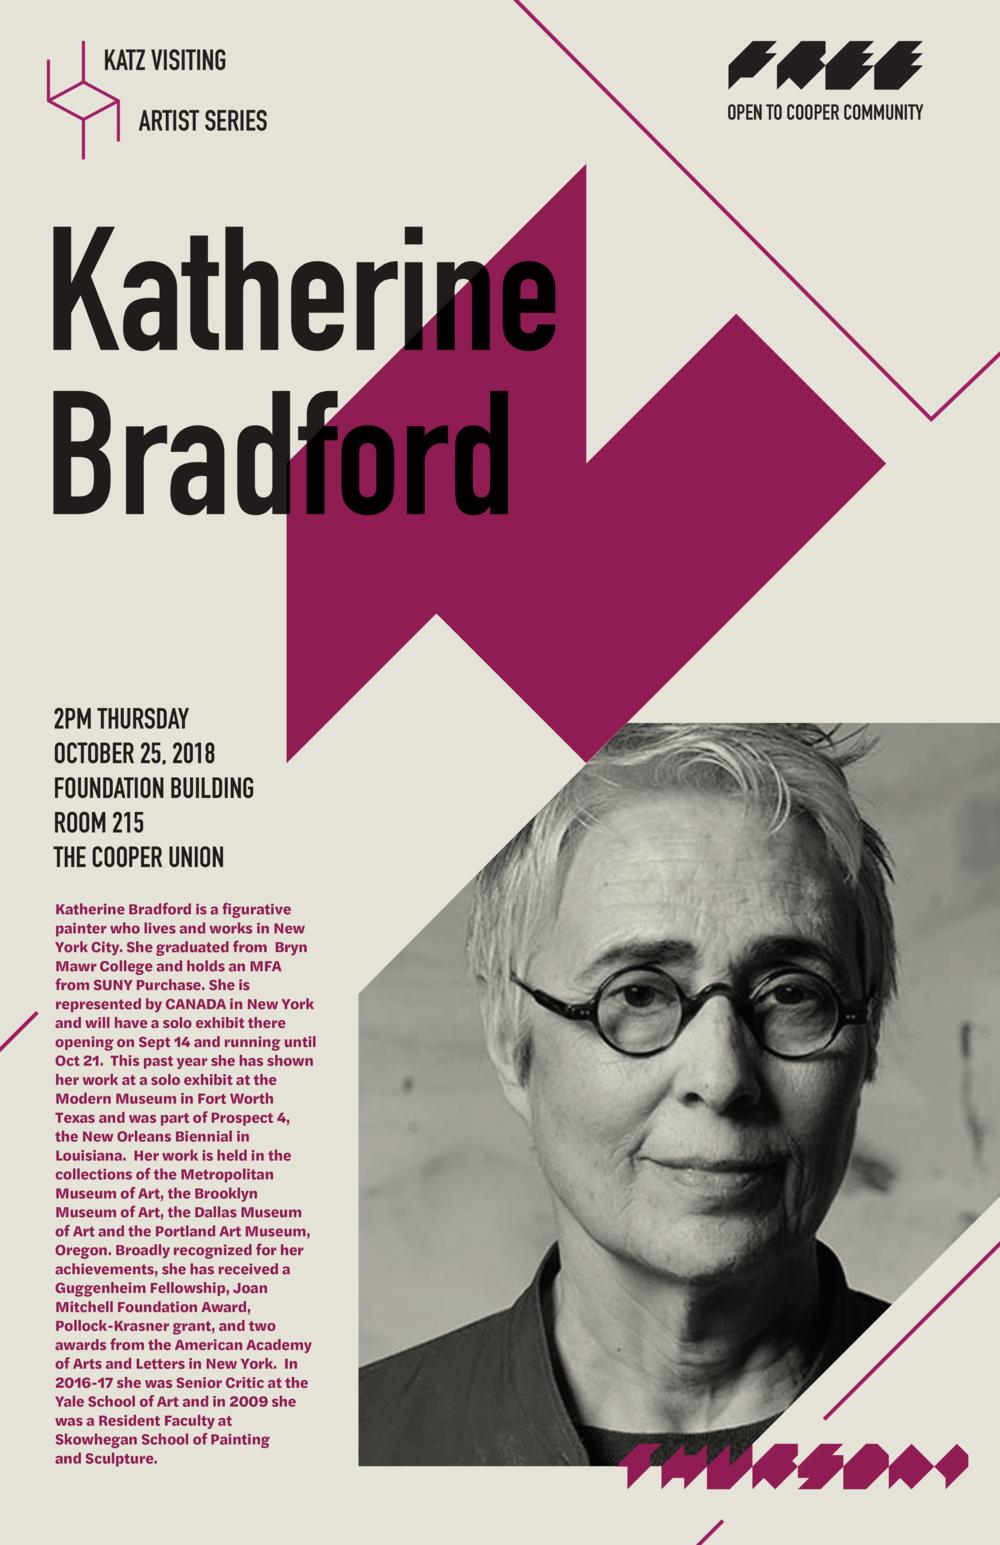 KatherineBradford_102518_Poster.png